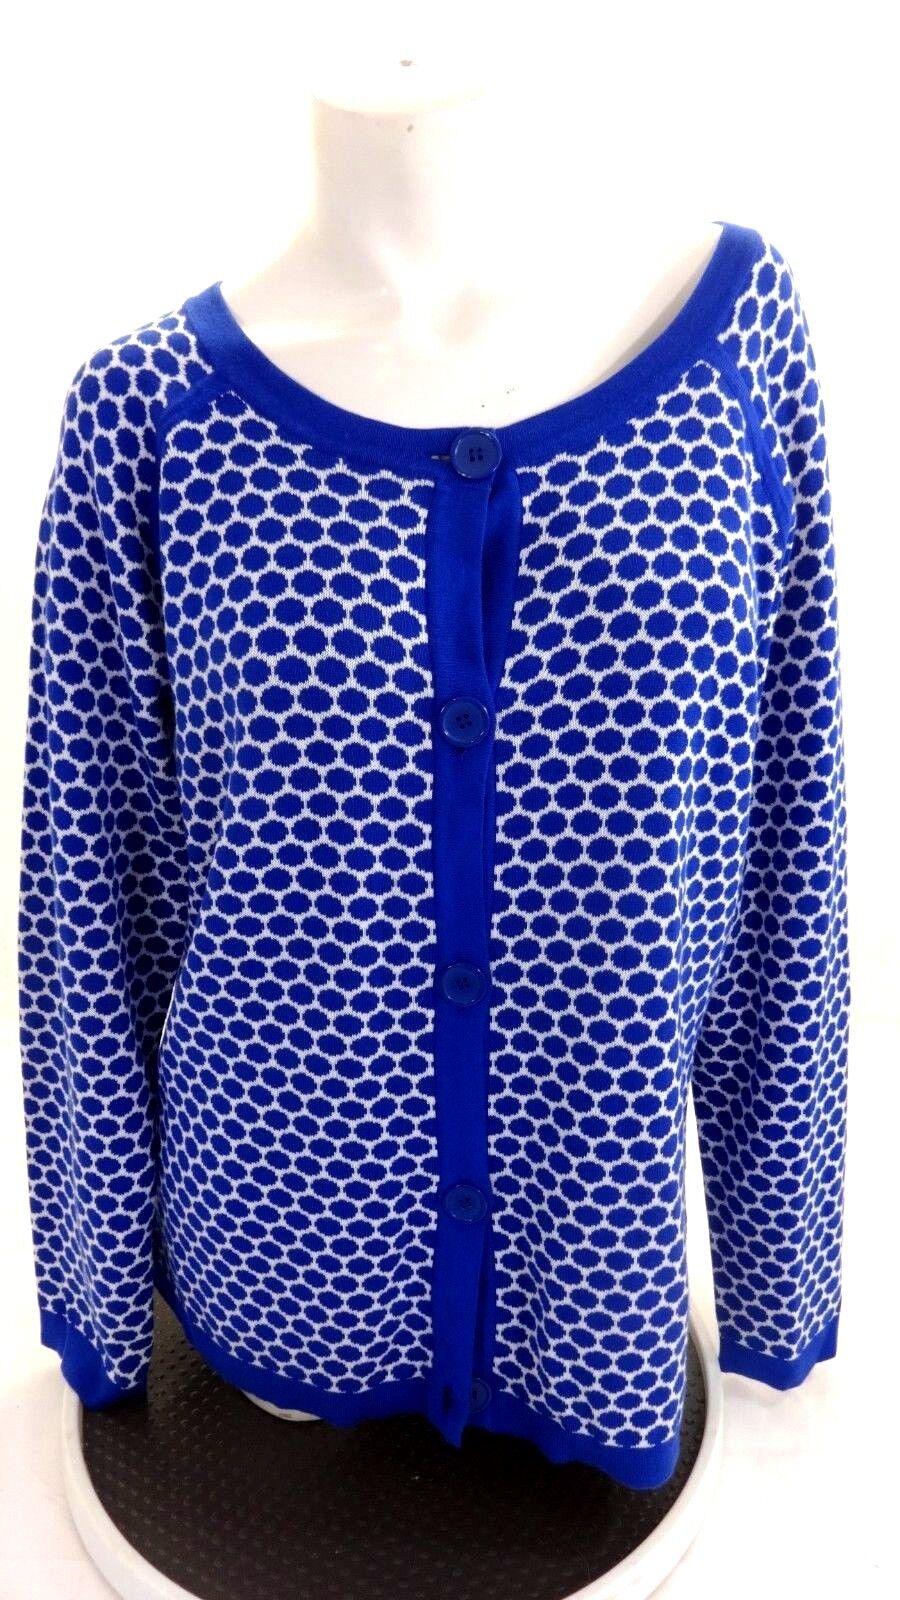 128 NWT NWT NWT PENDLETON WOMENS blueE REVERSIBLE COTTON CARDIGAN SWEATER SIZE XL 1ac9c4